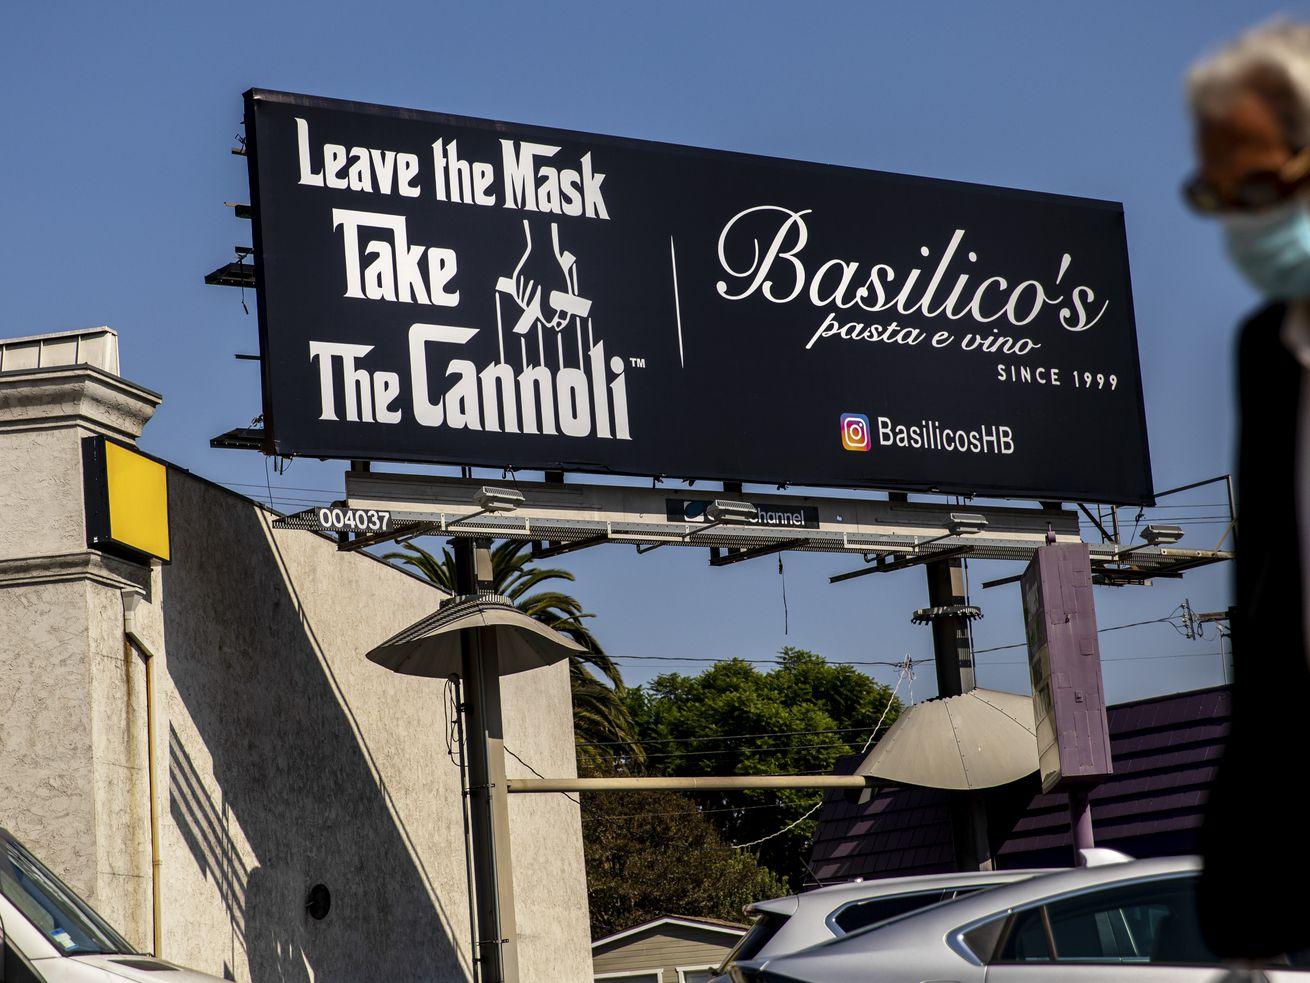 An anti-mask billboard along La Cienega Boulevard from the Huntington Beach restaurant Basilicos Pasta e Vino